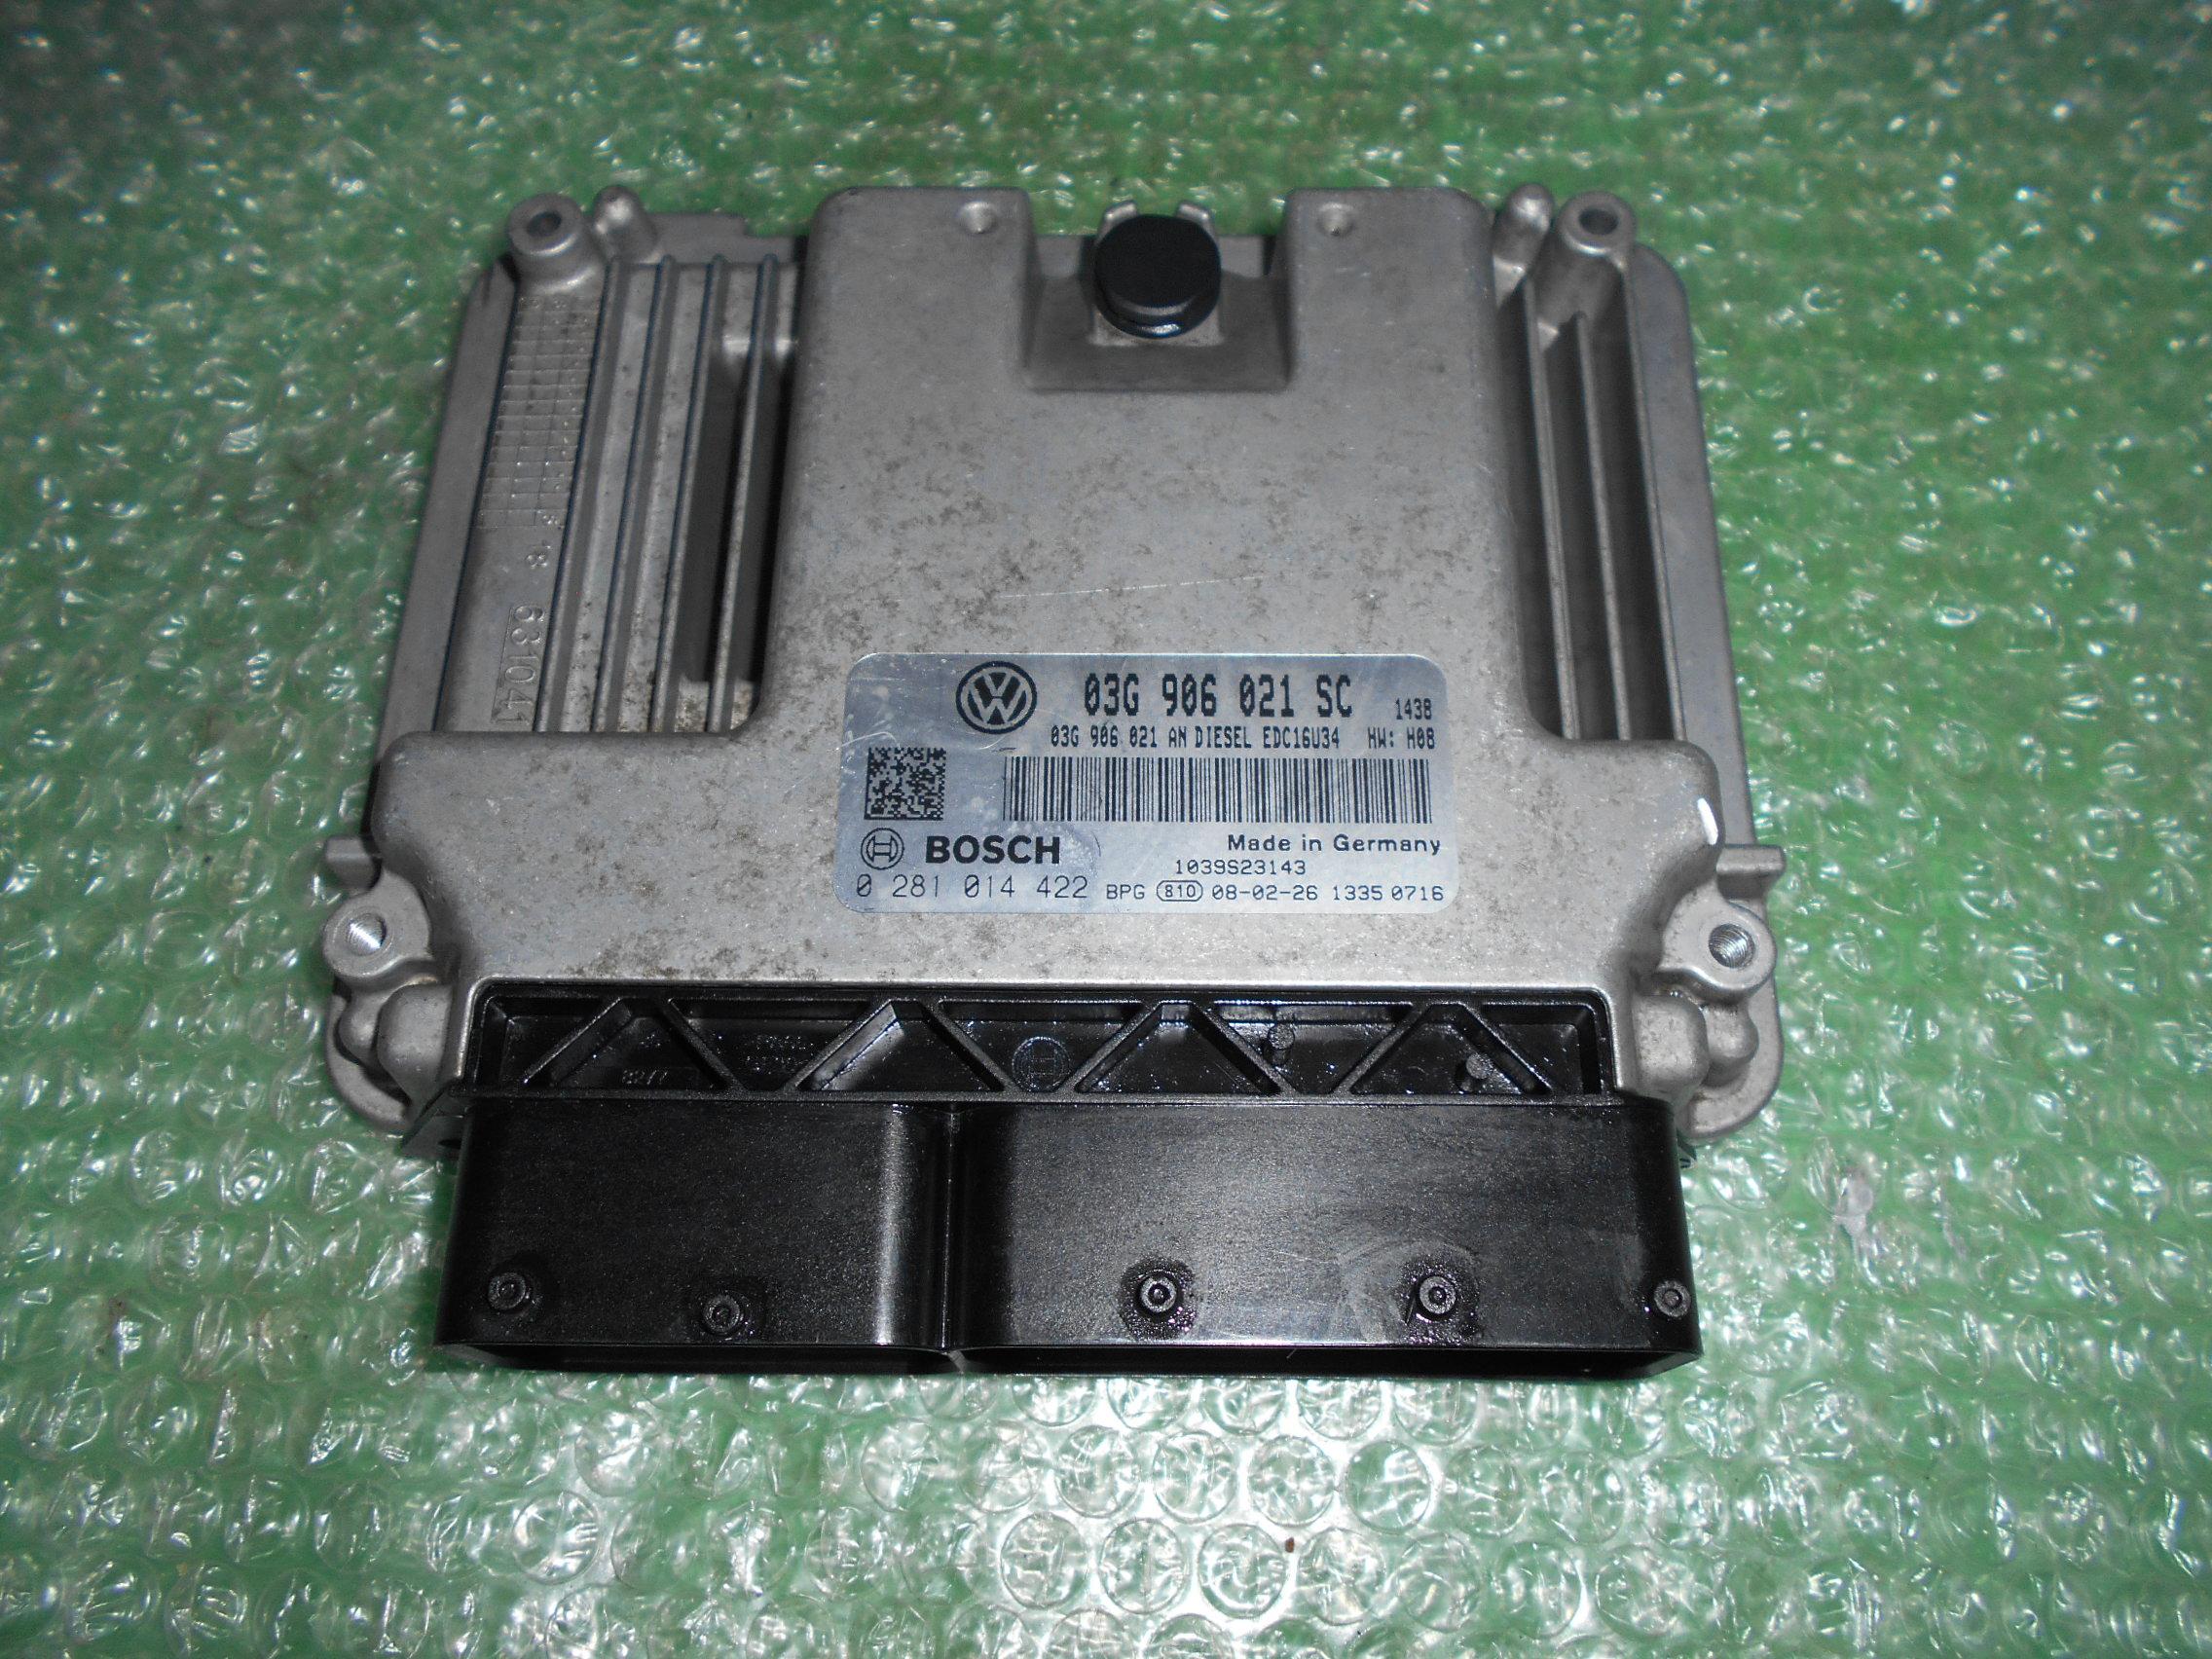 CENTRALITA UCE MOTOR 03G906021SC – BOSCH 0281014422 SEAT LEON II 1.9 TDI (105CV)(2005-2011)